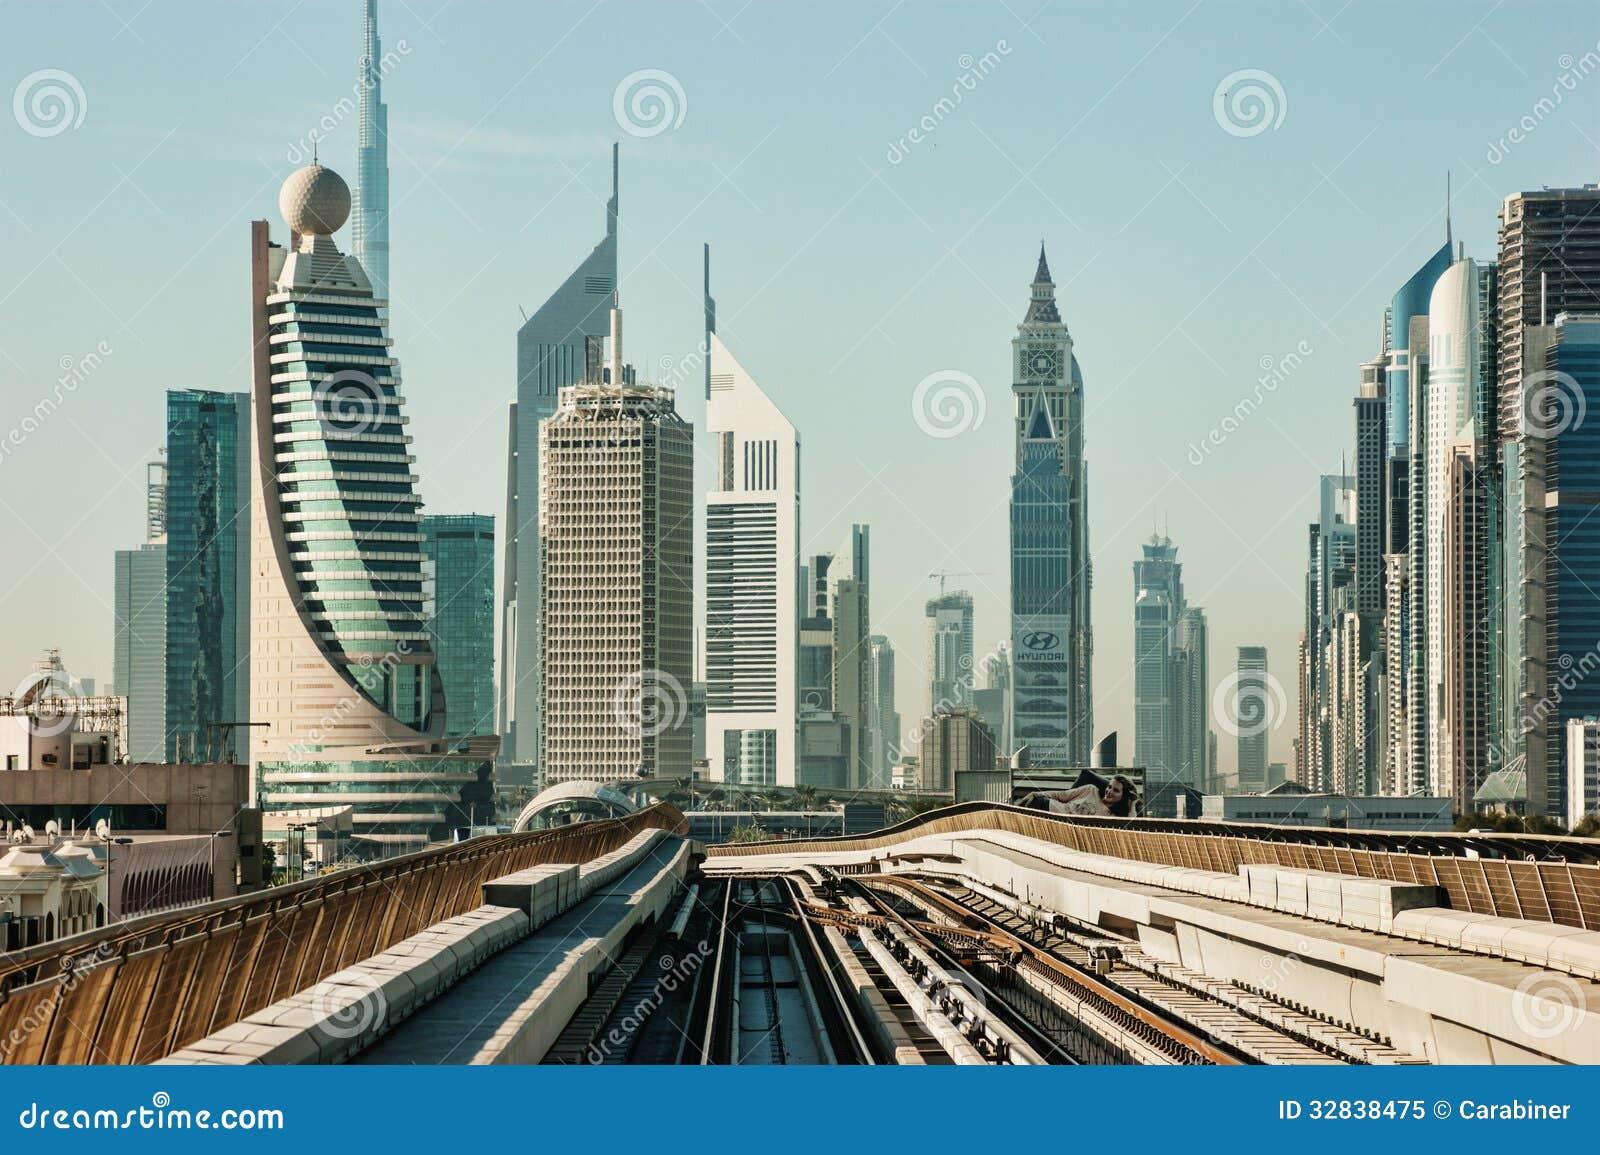 Subway Tracks In The United Arab Emirates Editorial Image